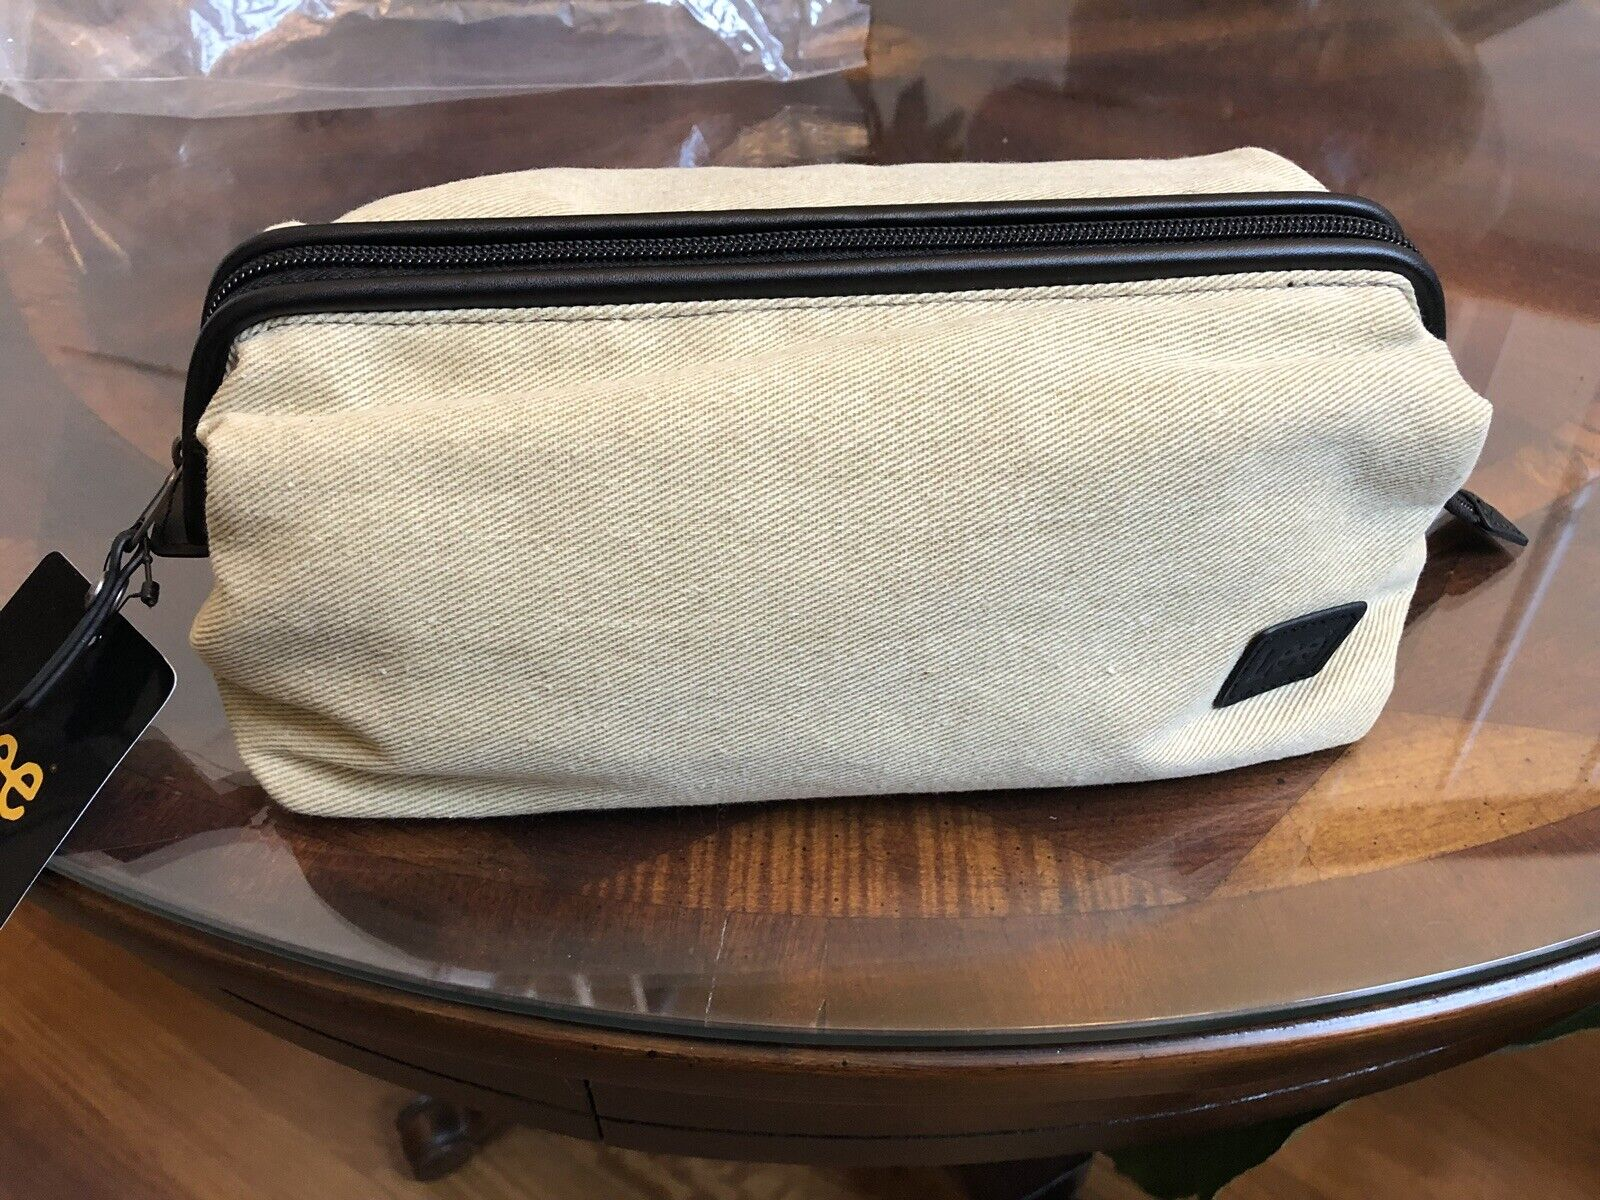 Lee Mens Dopp Bag, Travel Toiletry Bag *new* - s l1600